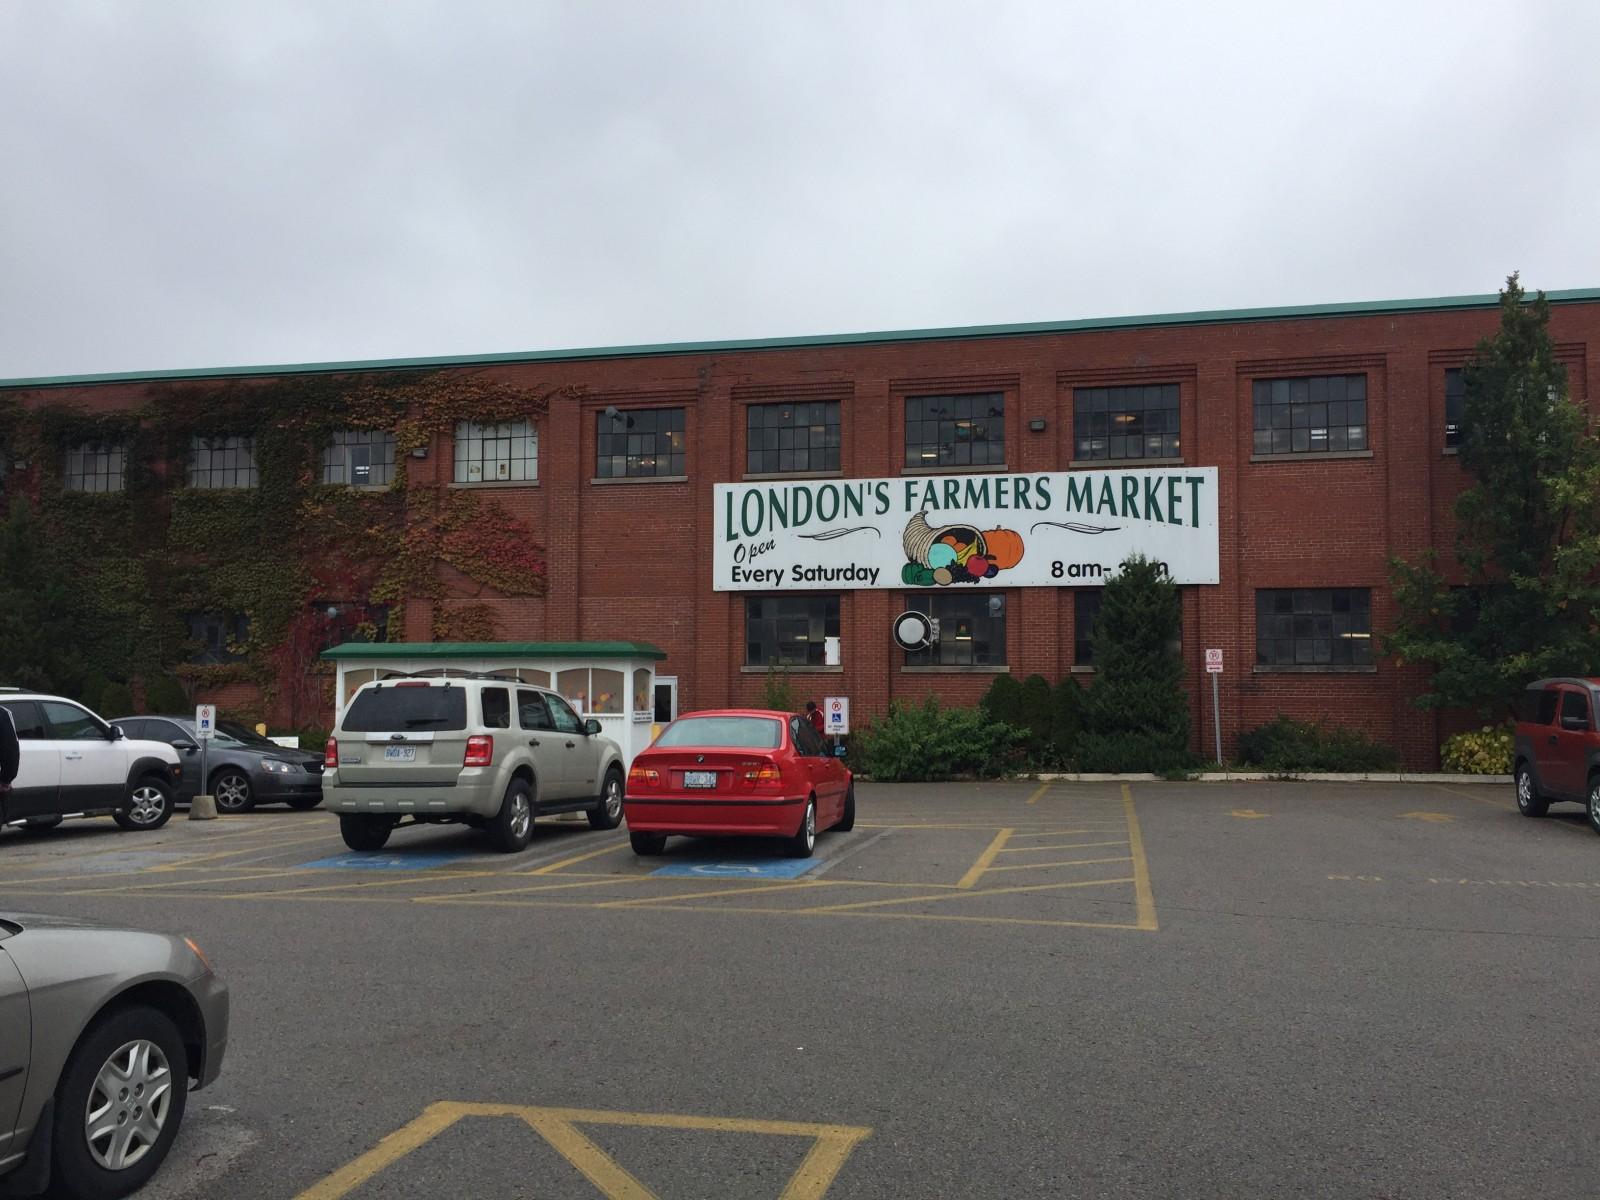 Western fair artisans' market